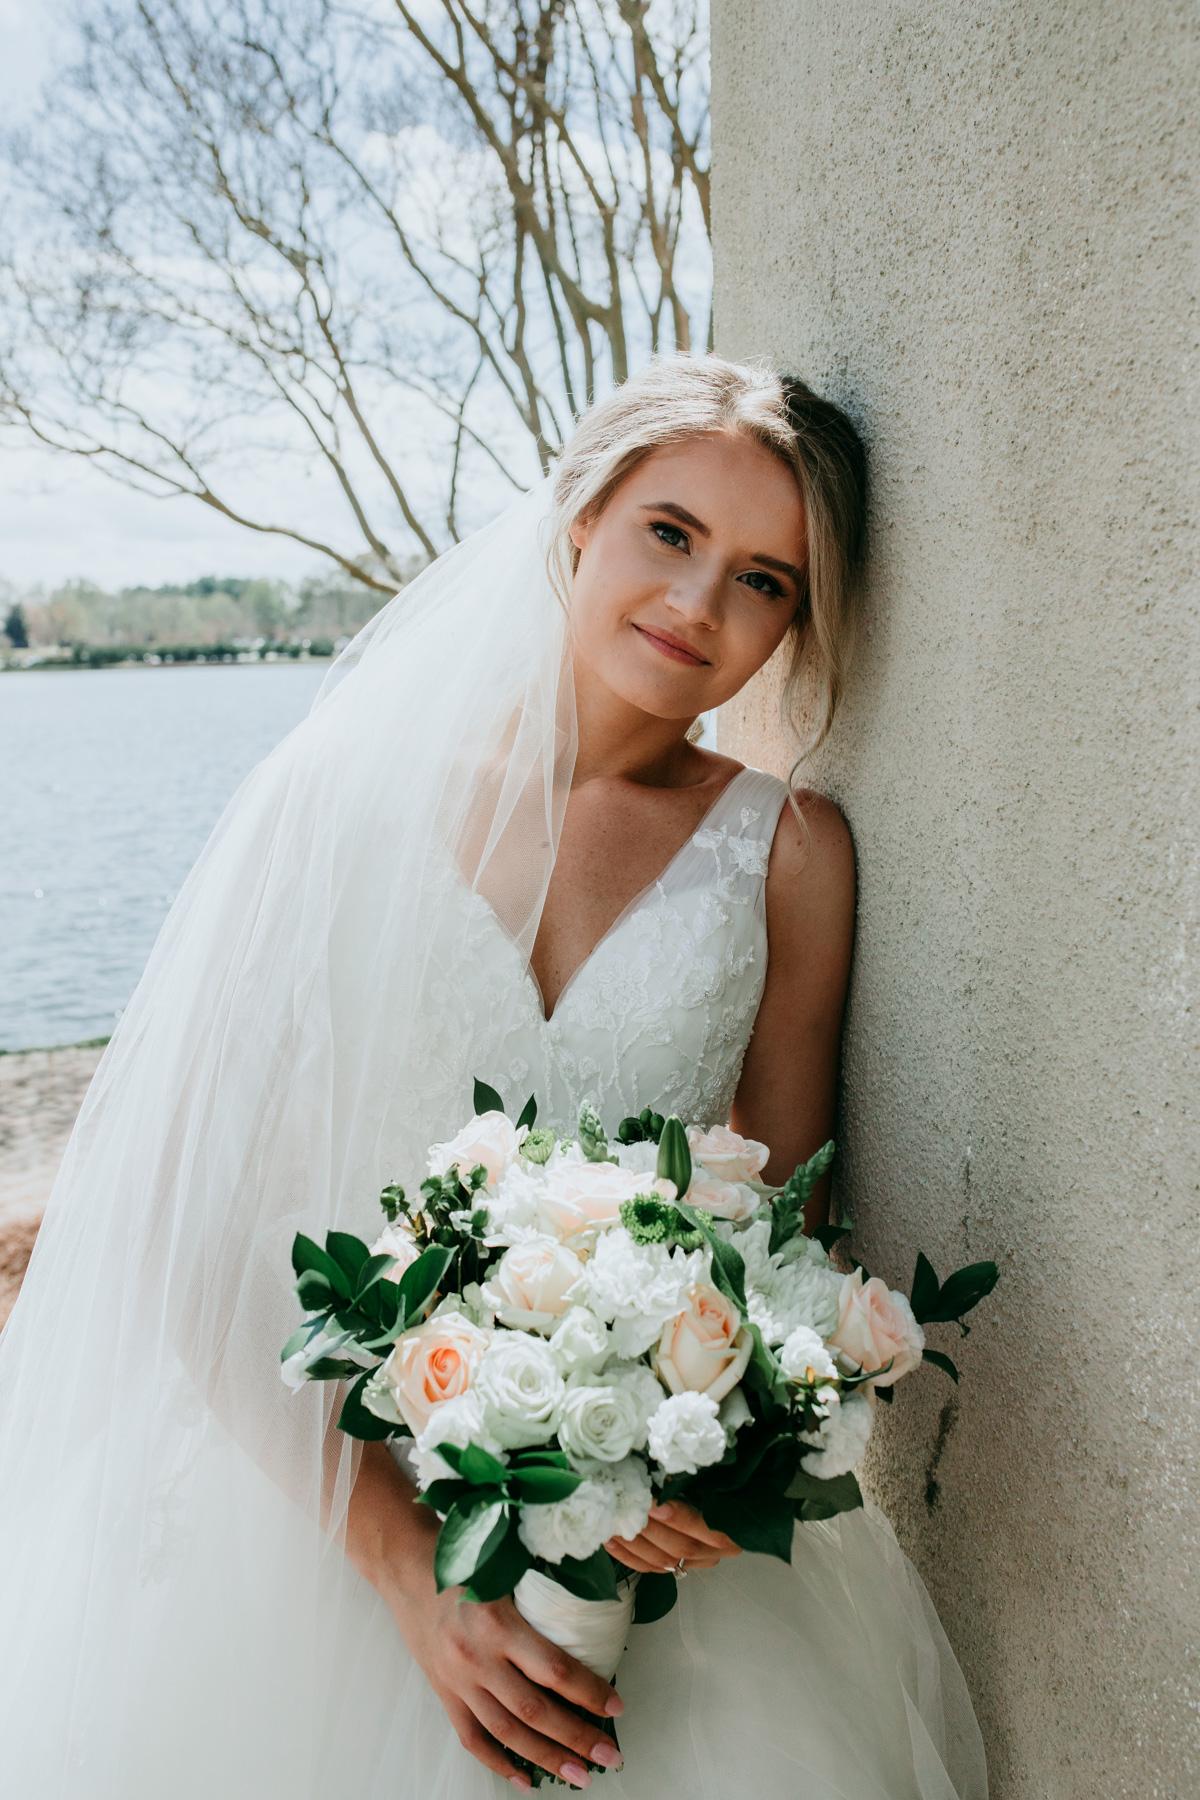 newly-married-bride-photos.jpg